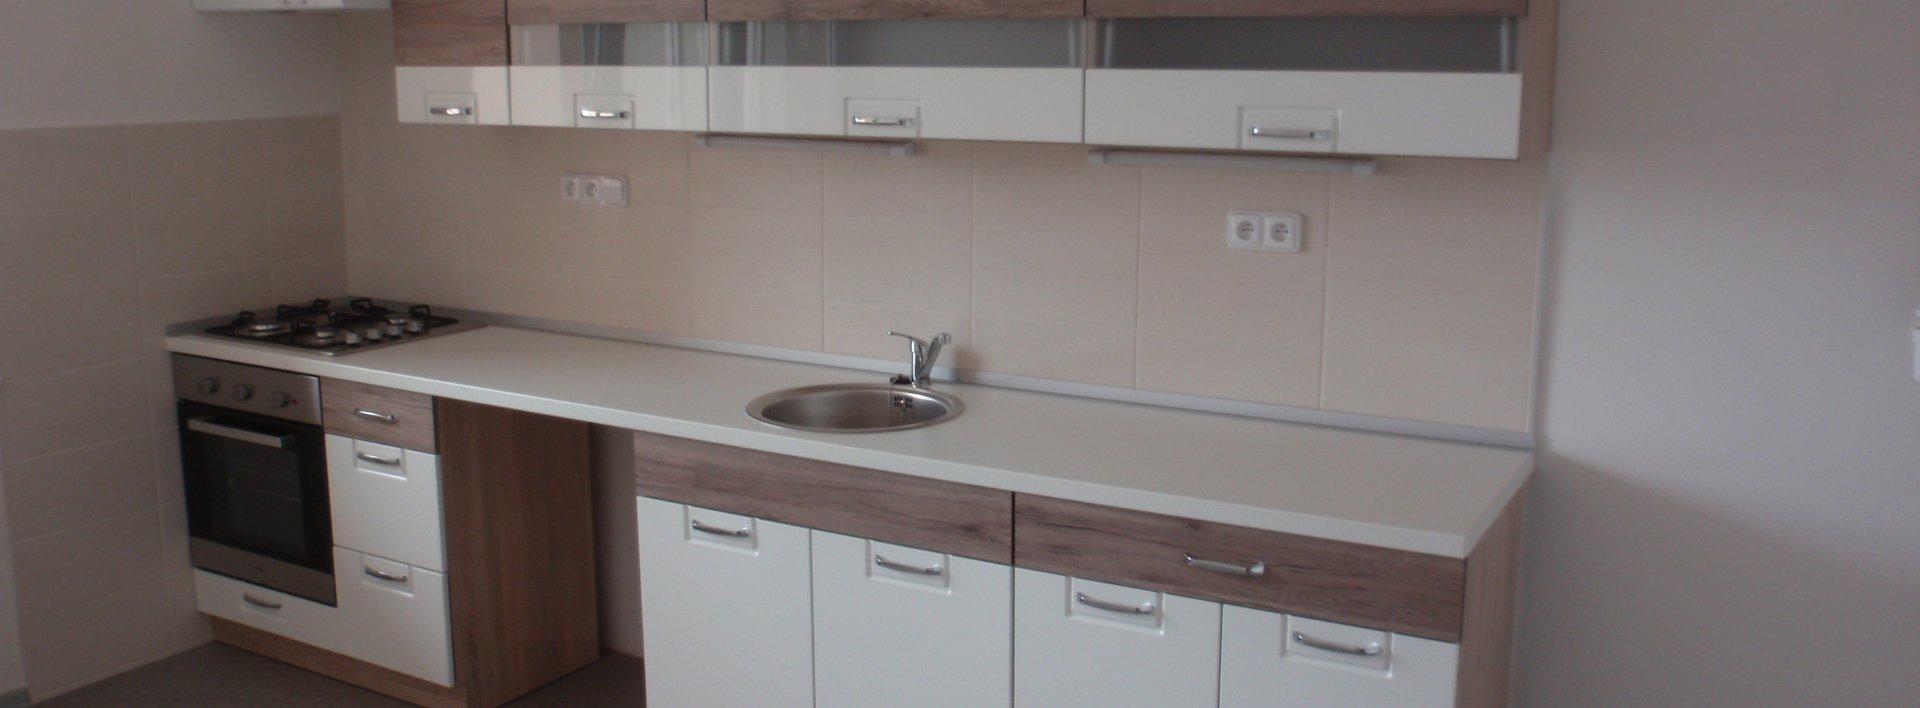 Pronájem bytu 3+1, 108 m² - nám. Soukenné, Liberec III, Ev.č.: N49141